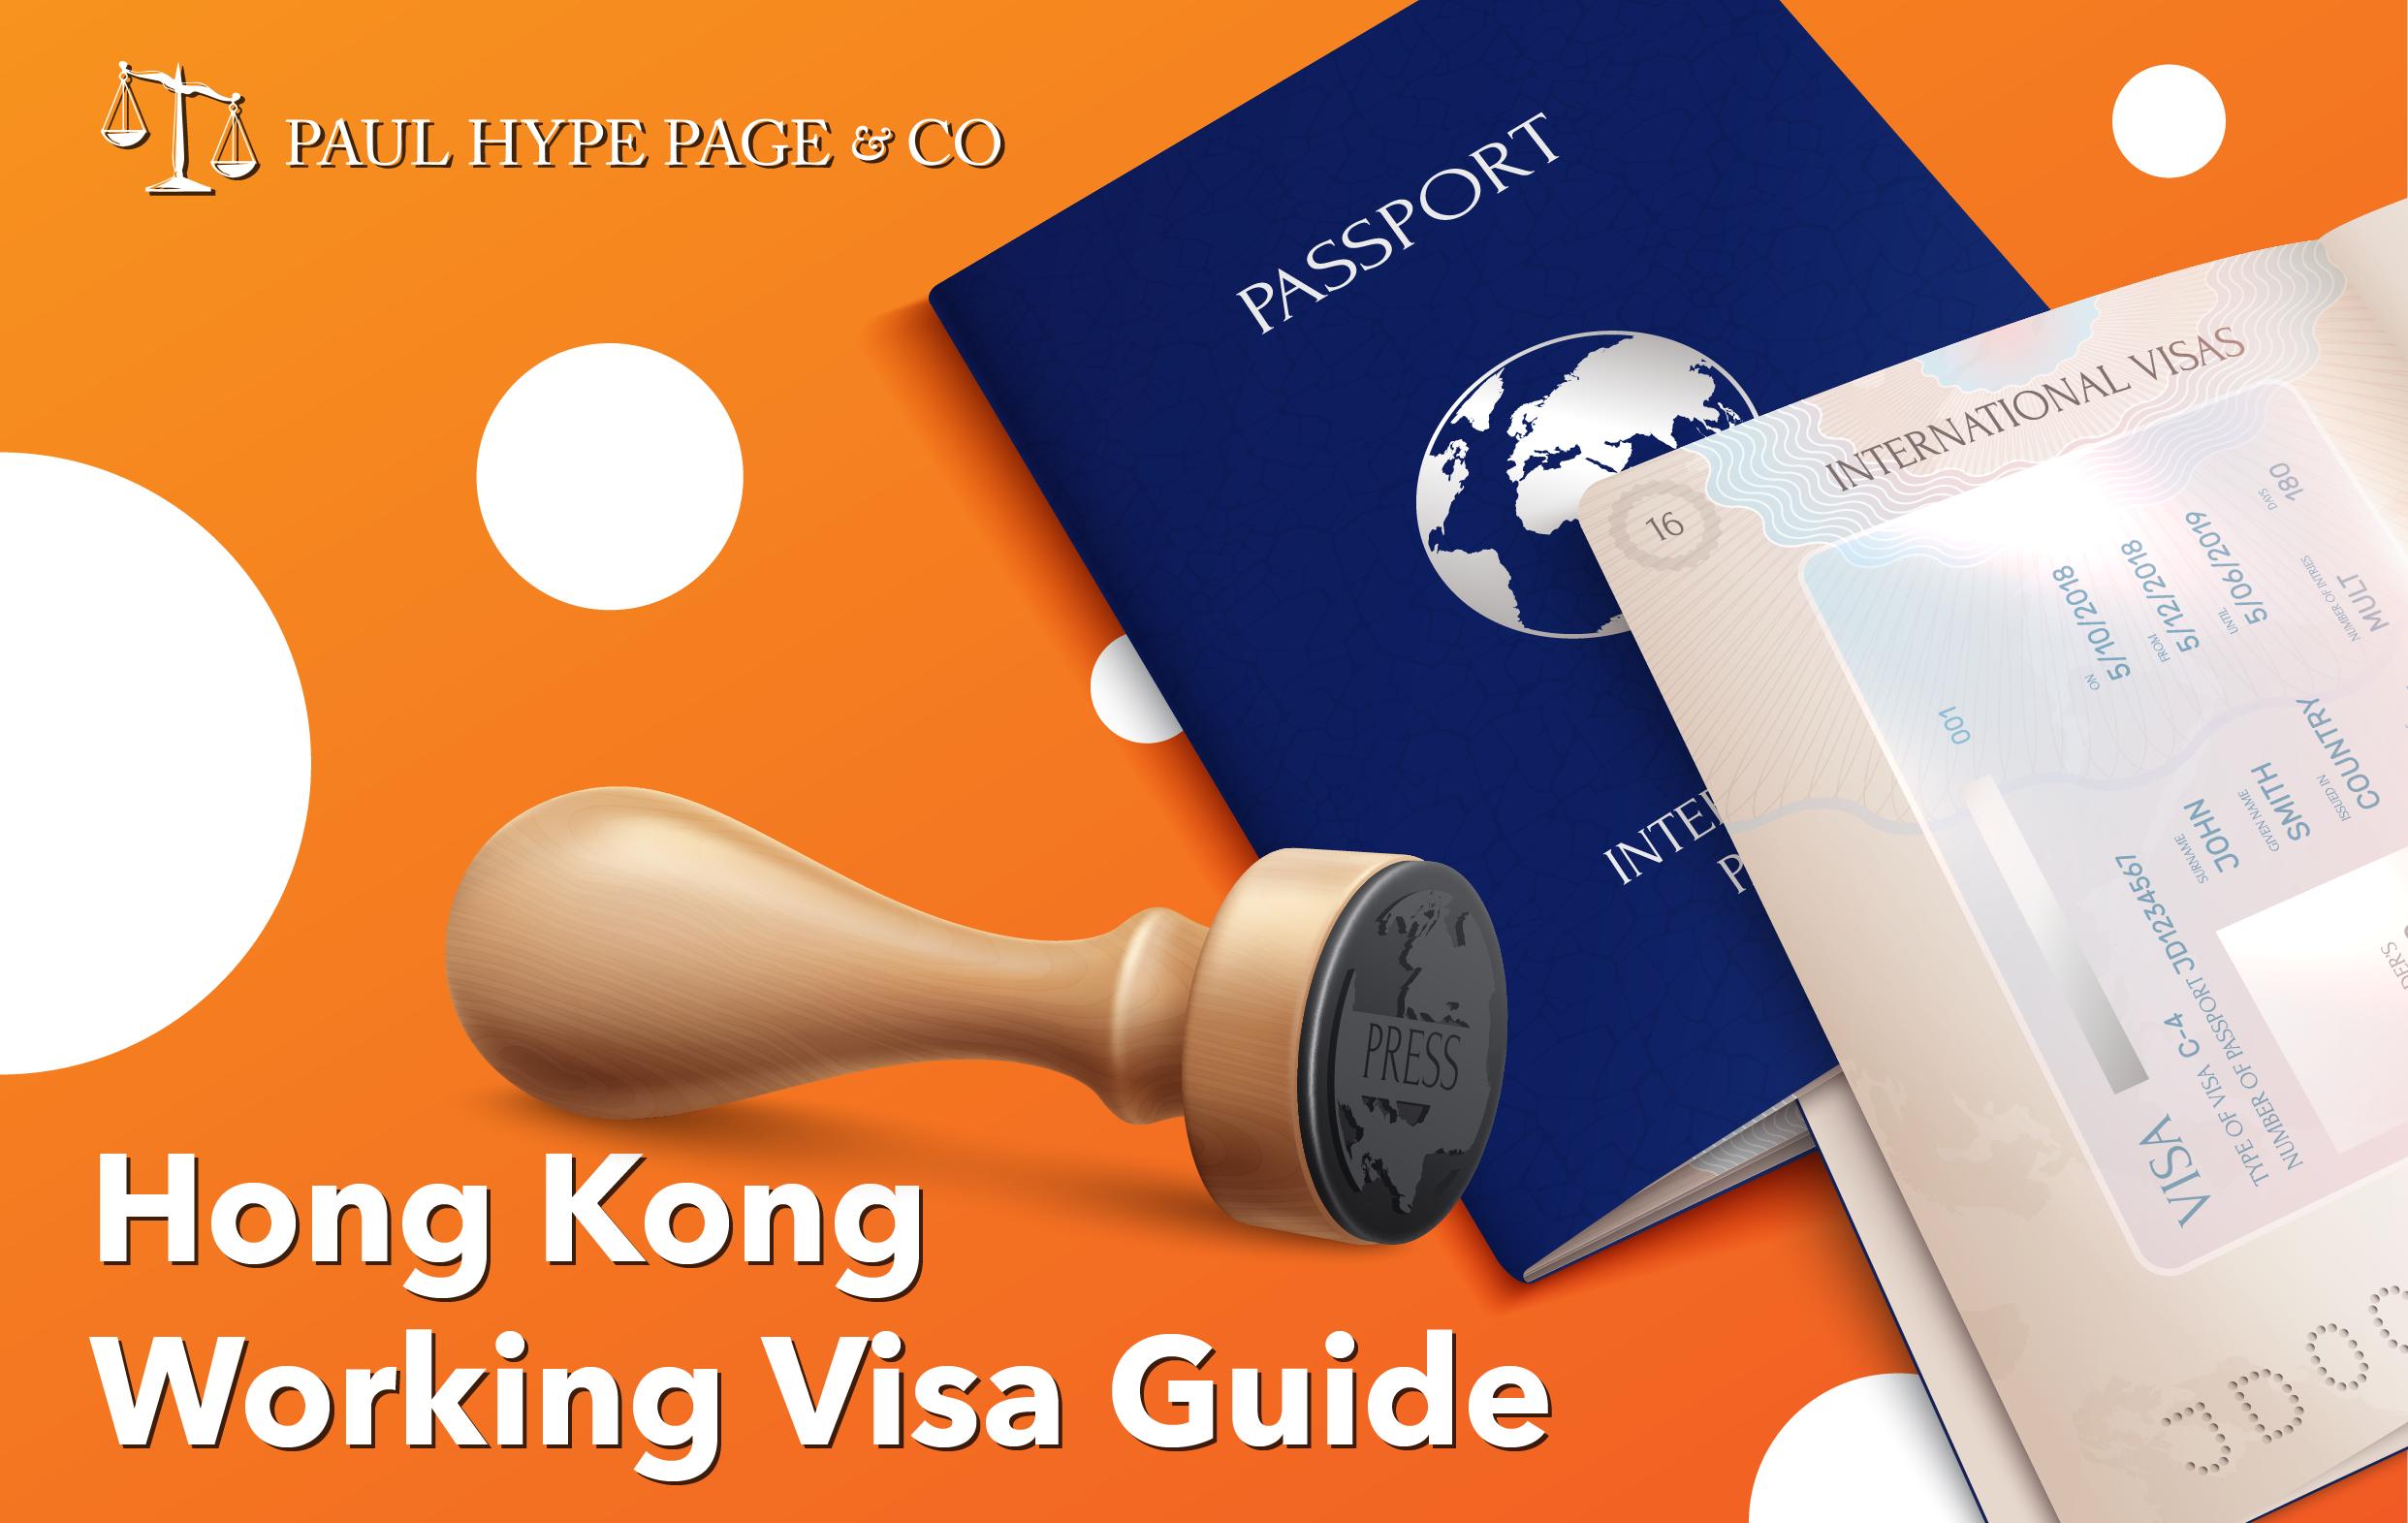 Working Visa Guide in Hong Kong